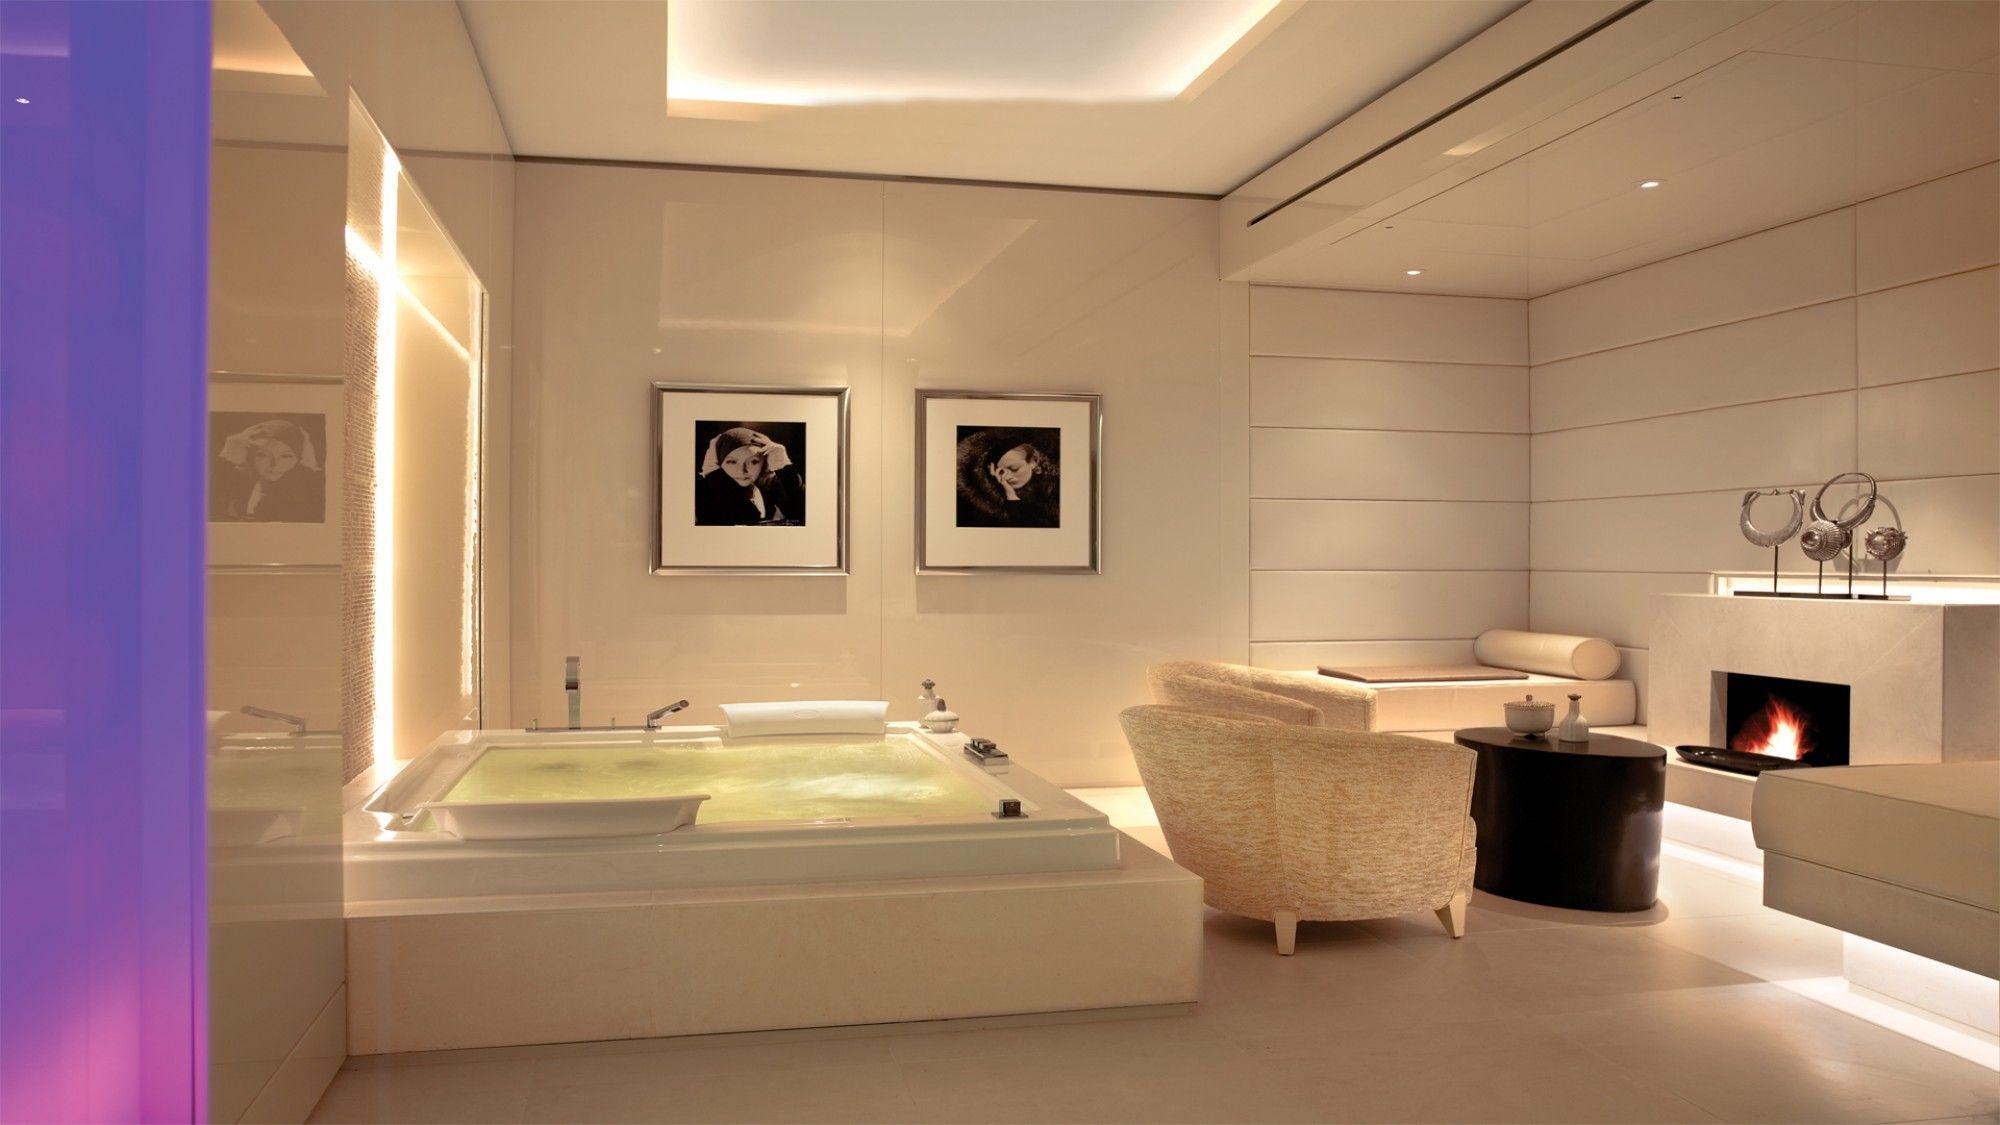 Adlon Spa By Resense Hoteleinrichtung Hotels Spa